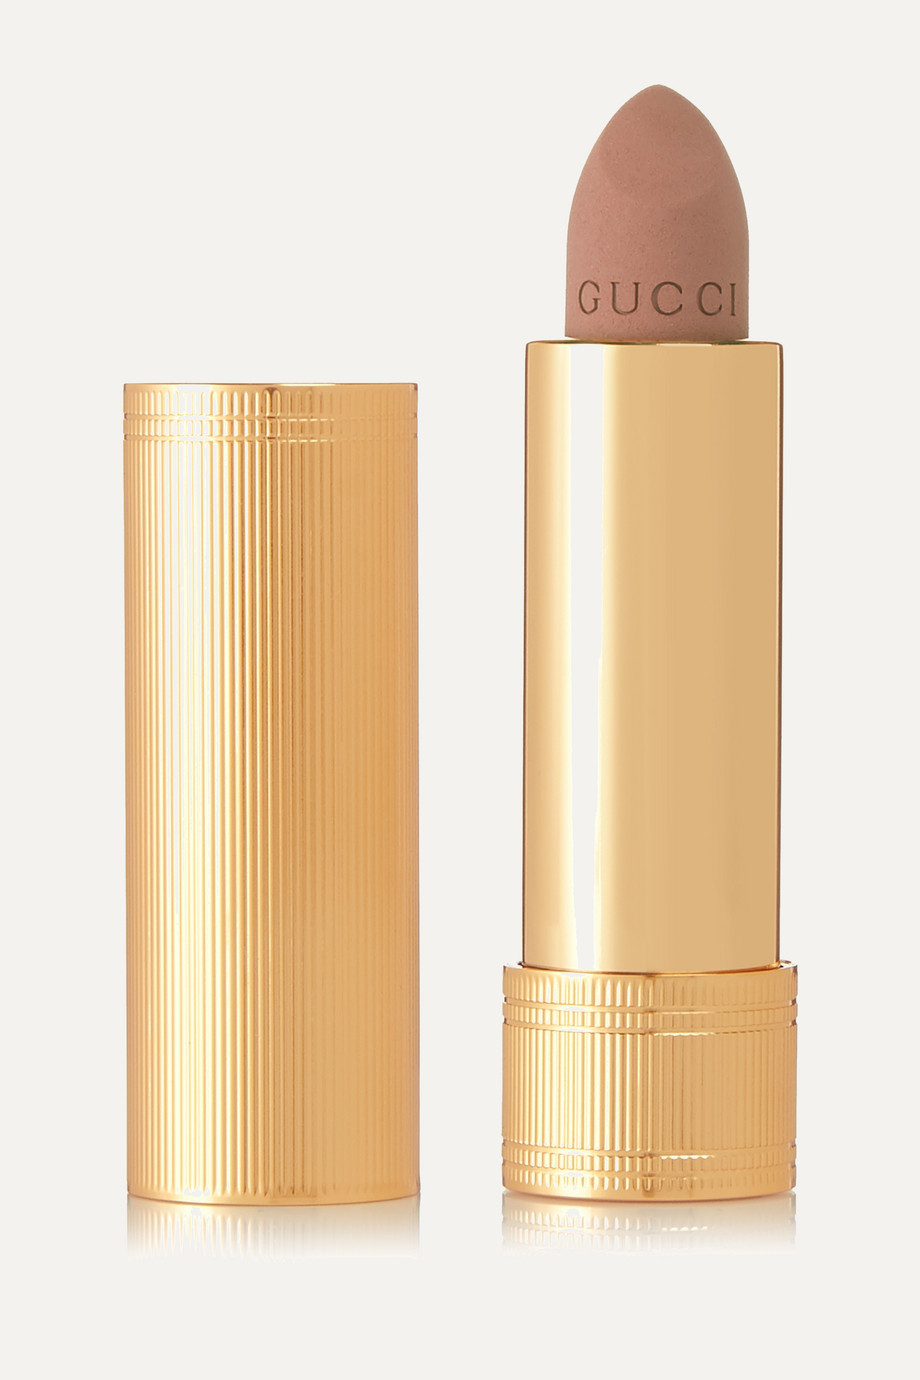 Gucci Beauty Rouge à Lèvres Mat Lipstick – Carol Beige 103 – Lippenstift